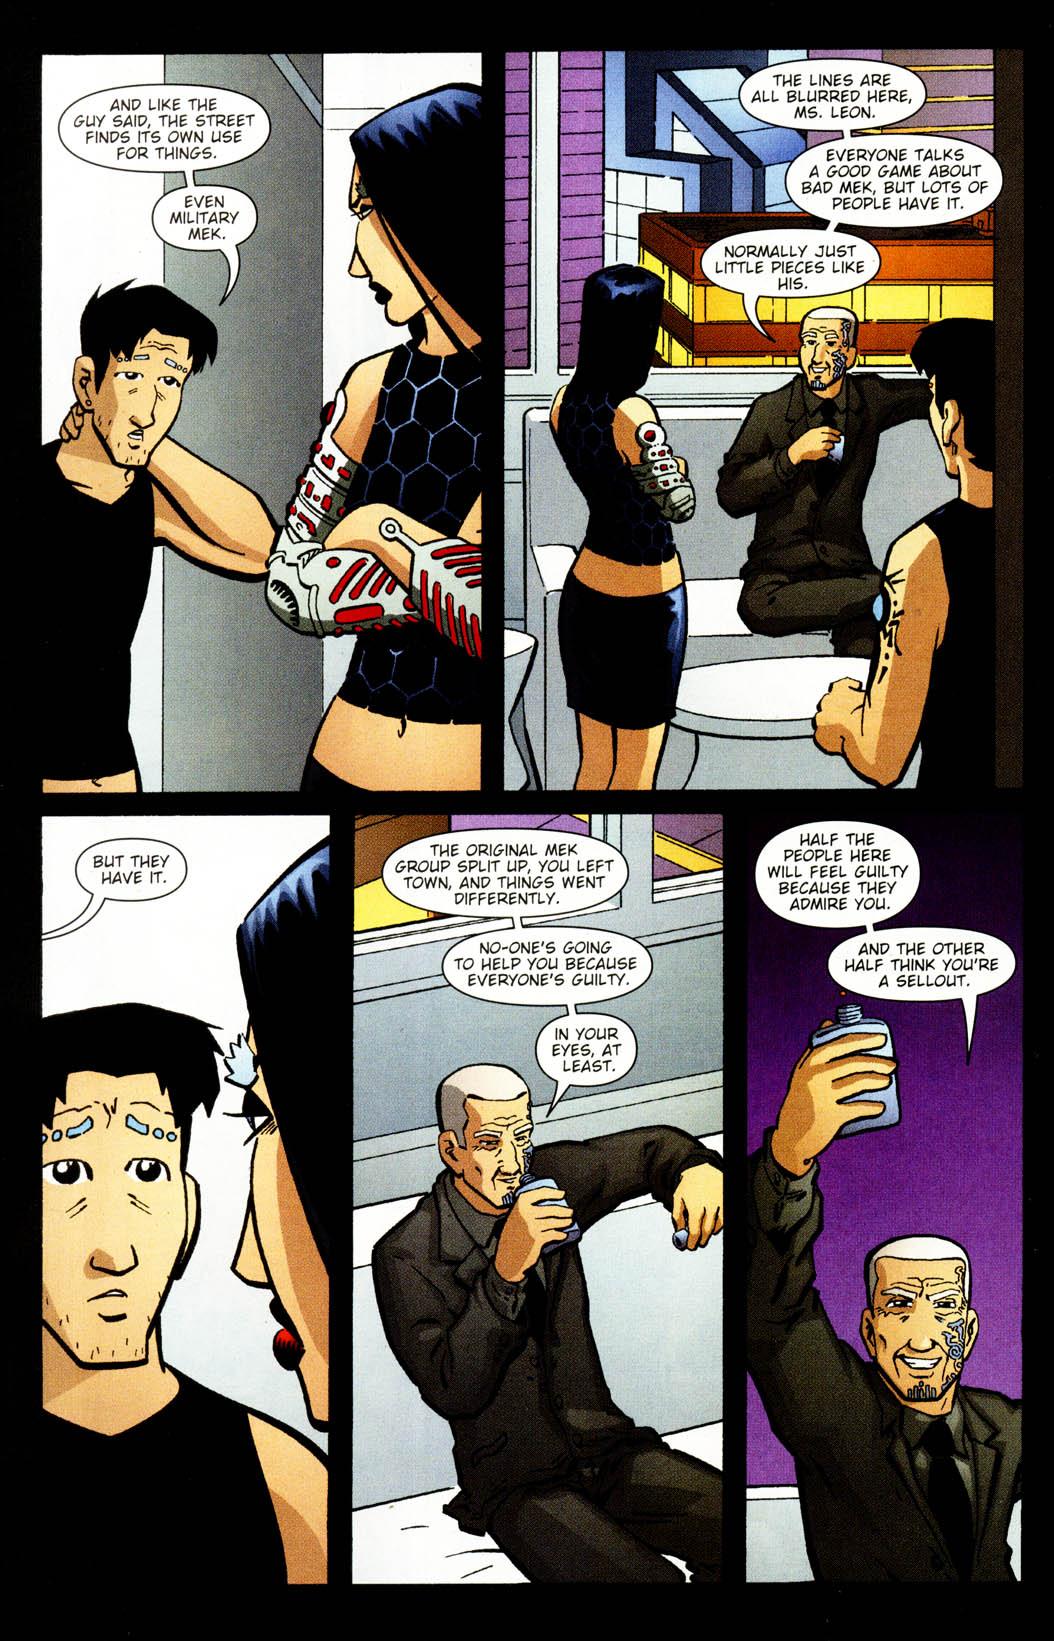 Read online Mek comic -  Issue #2 - 16